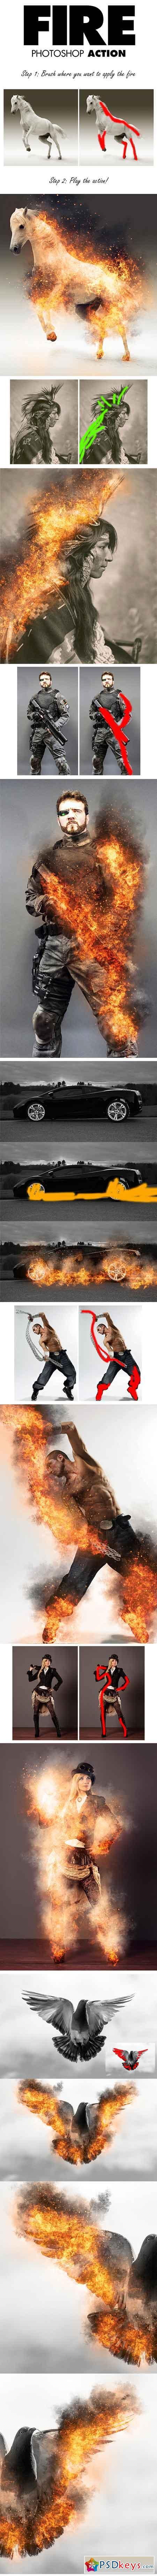 Action lửa cháy